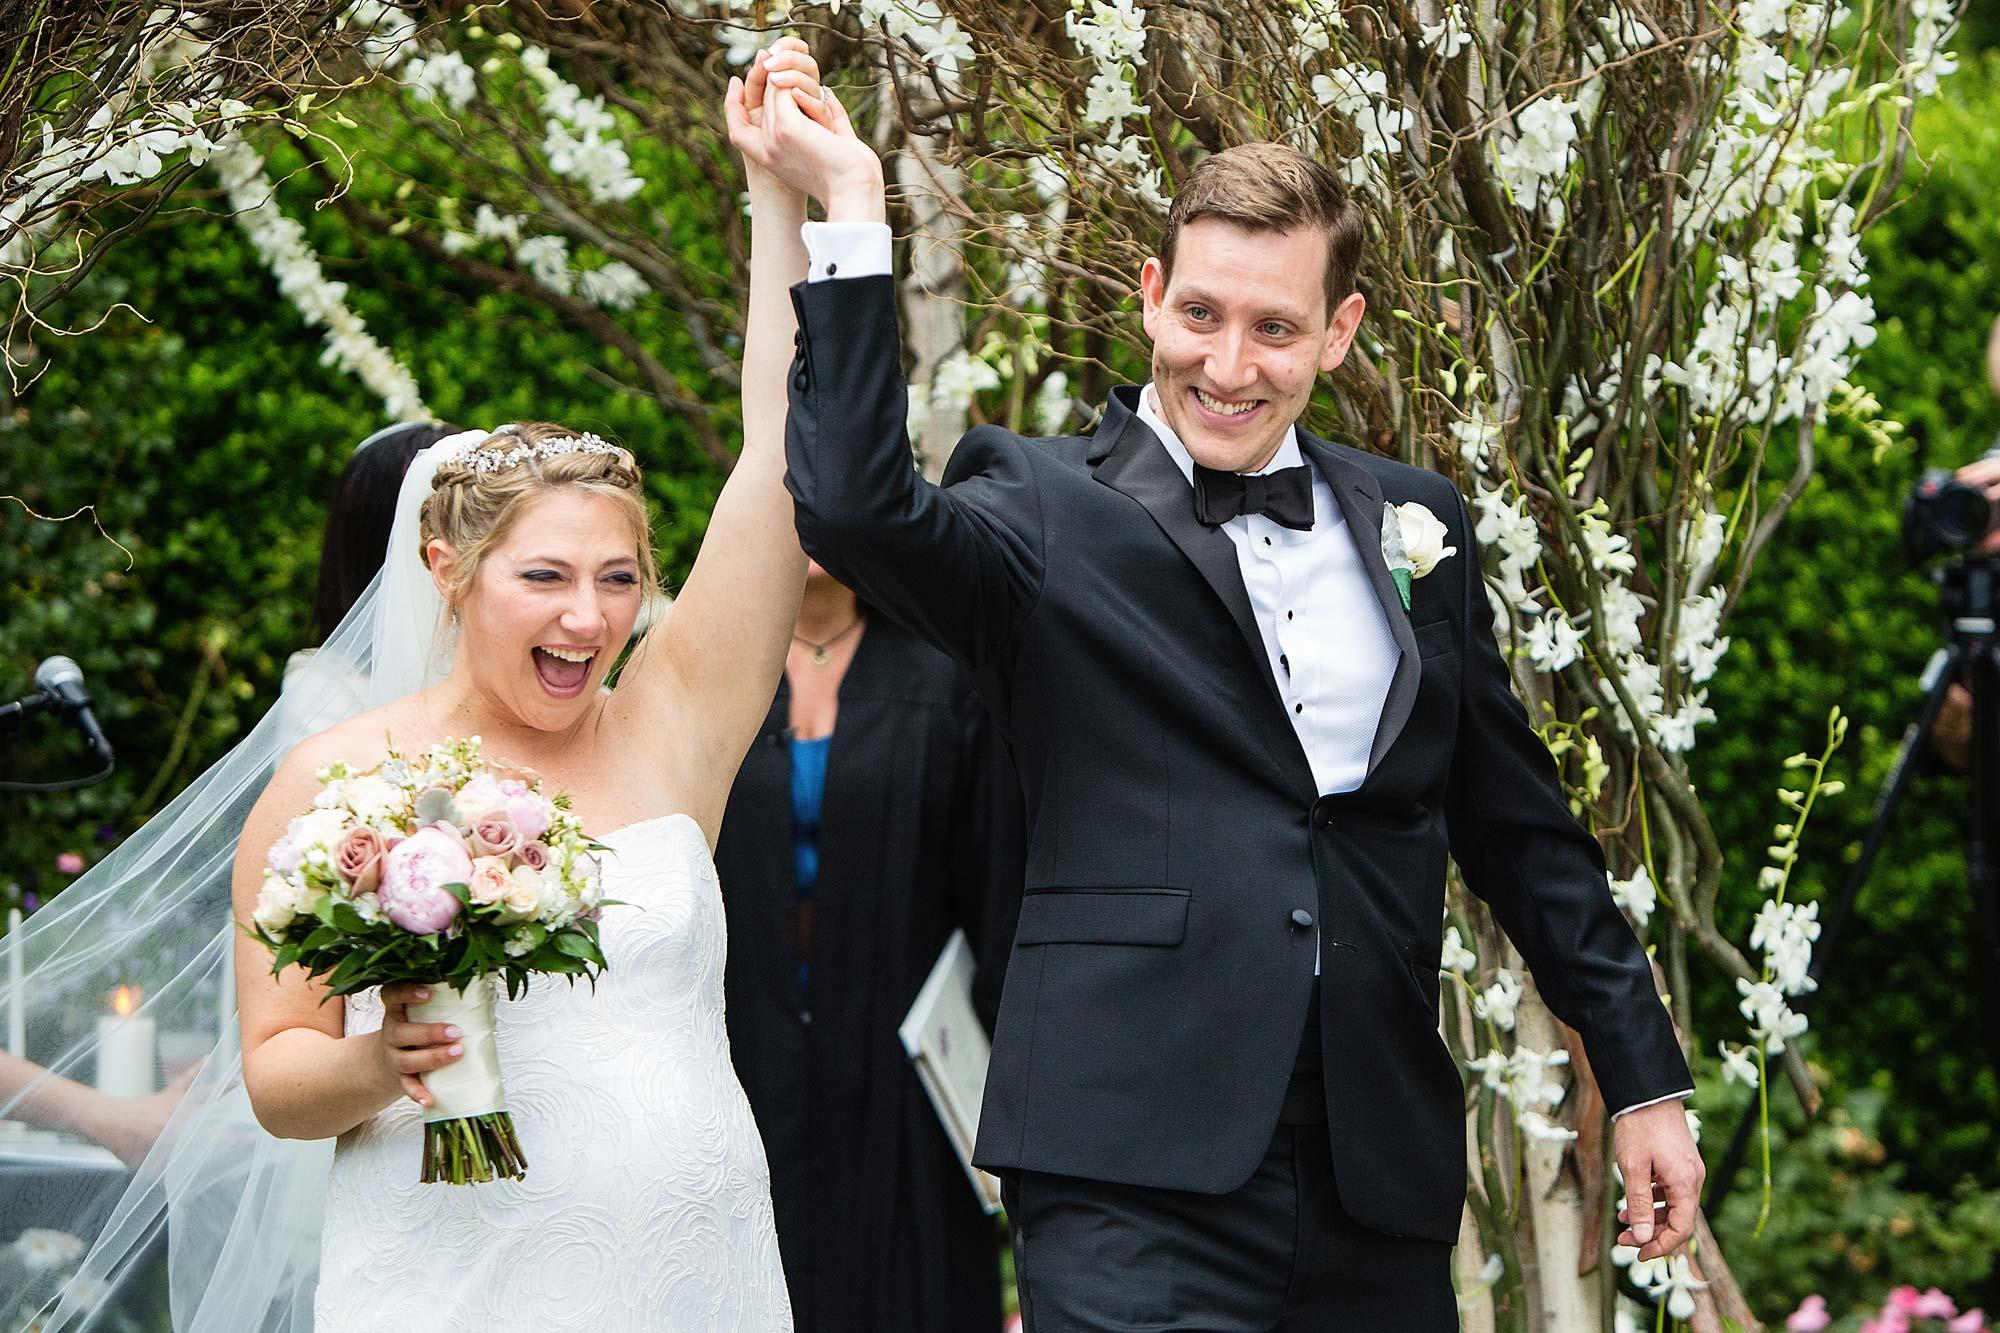 The-Royalton-at-Roslyn-Country-Club-Wedding